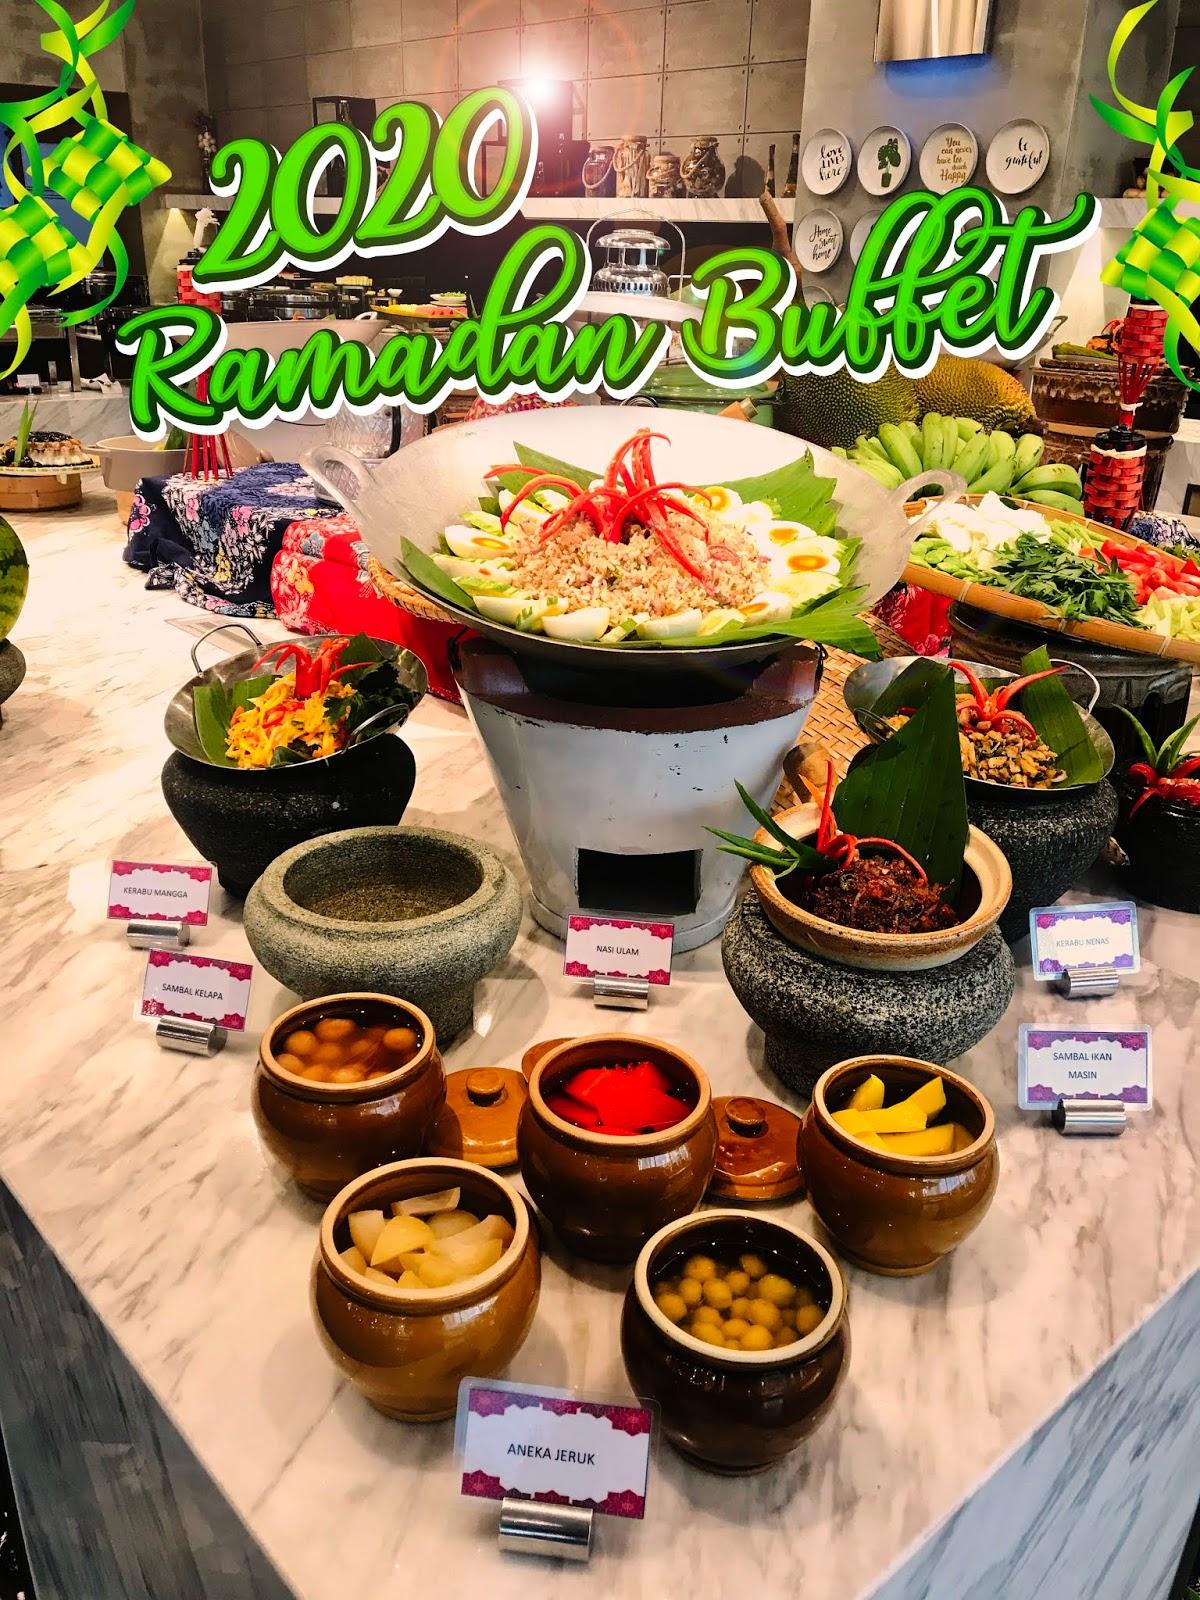 [FOOD REVIEW] RAMADAN BUFFET CITARASA KAMPUNGKU @ UTARA, ARMADA HOTEL PETALING JAYA